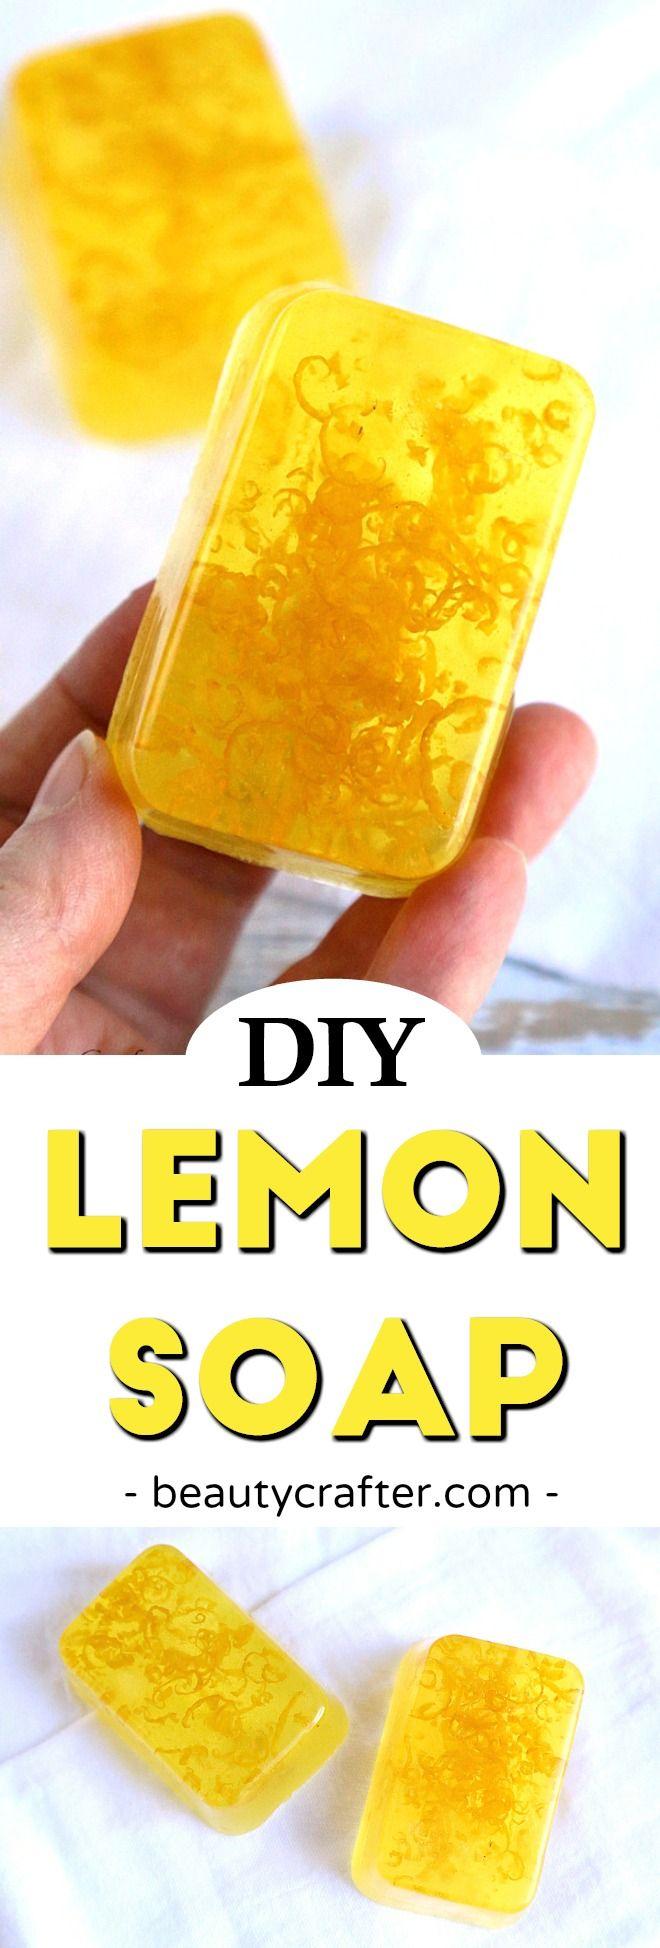 Lemon Soap - DIY Soap Recipe -  Rezept für erfrischende Zitronen Seife. Geschenkidee! #soap #Seife